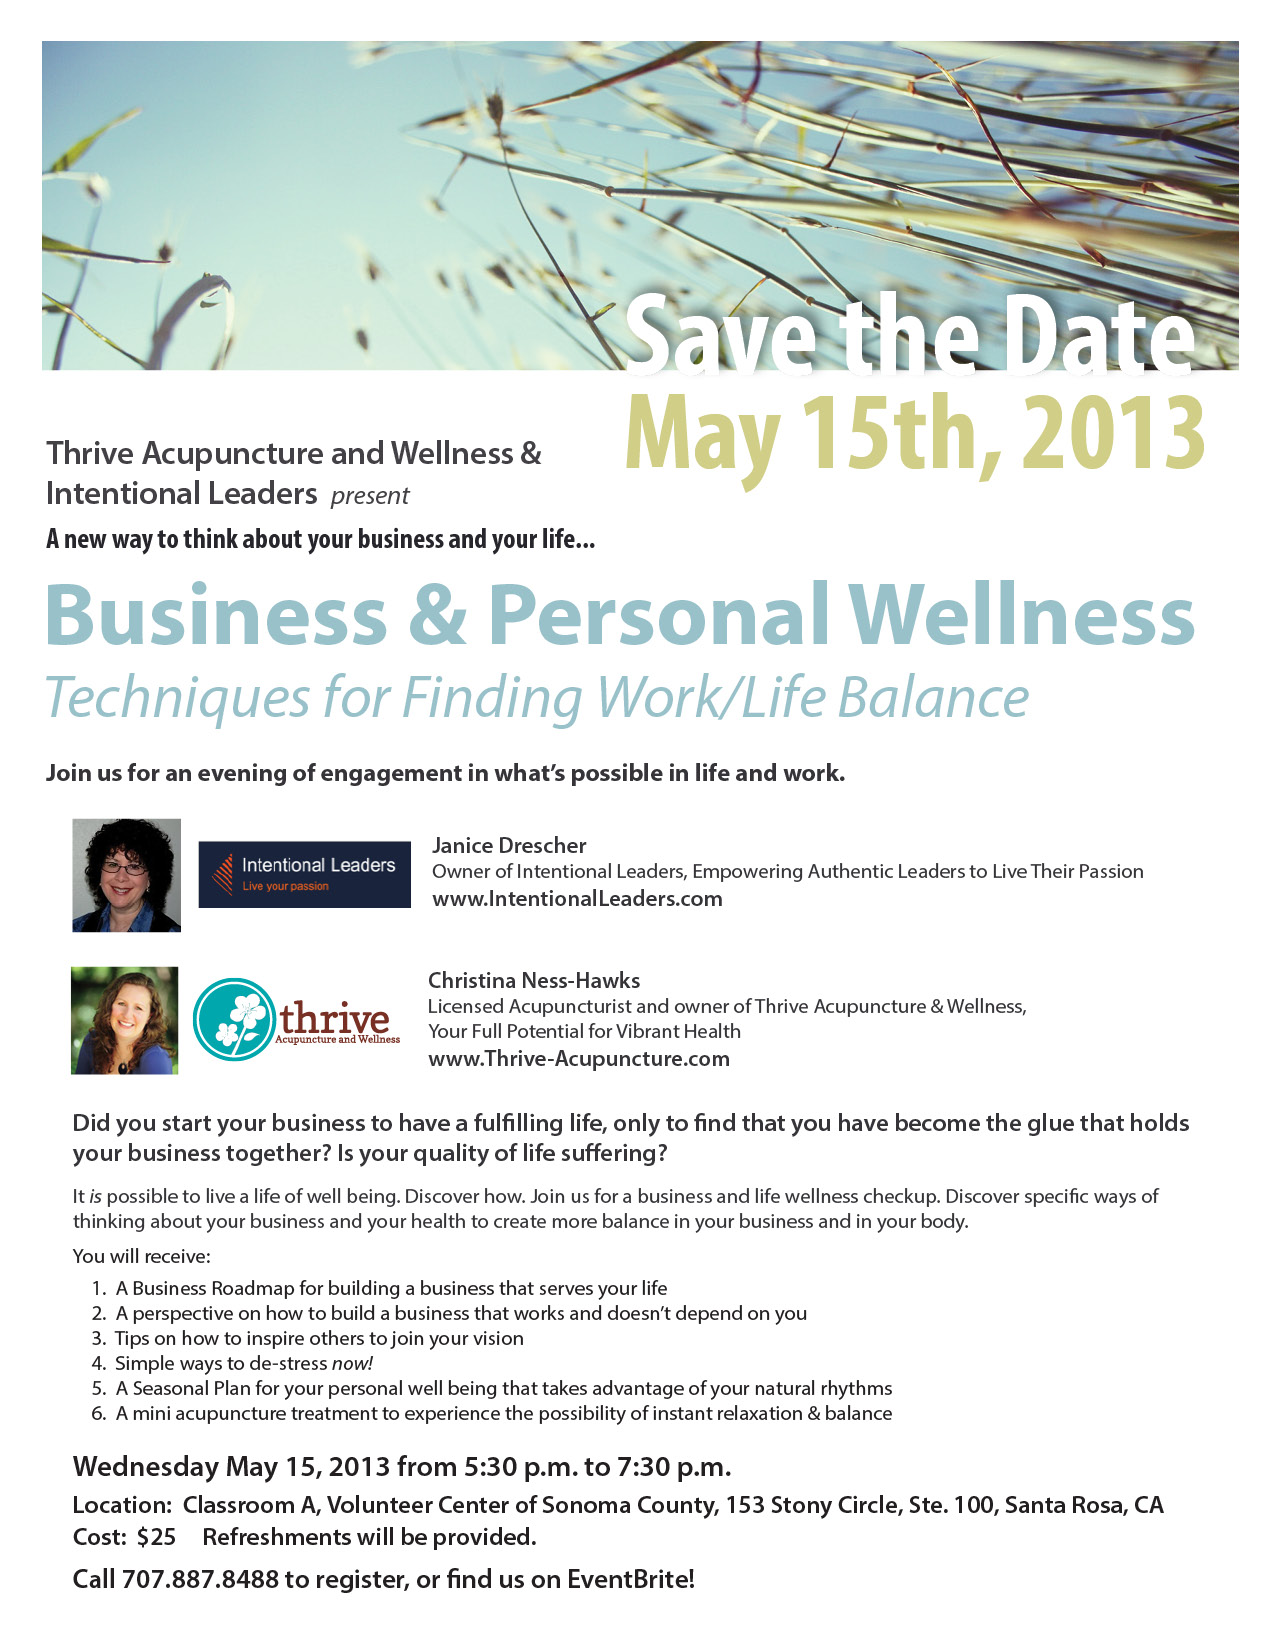 Business & Personal Wellness, Santa Rosa, CA